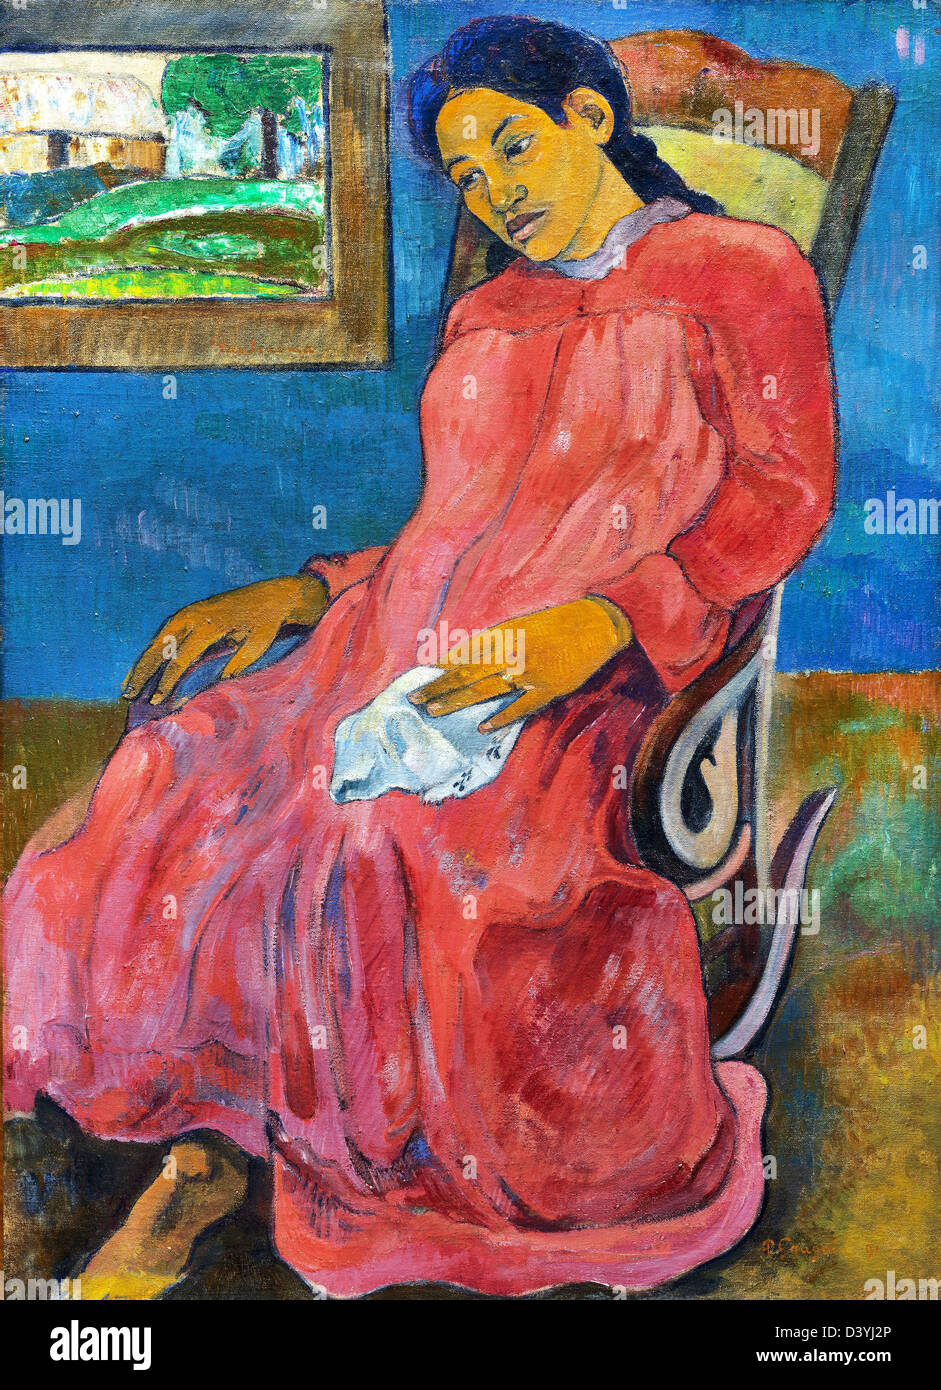 Paul Gauguin, Melancholic 1891 Oil on canvas. Nelson-Atkins Museum of Art, Kansas City, Missouri, USA - Stock Image